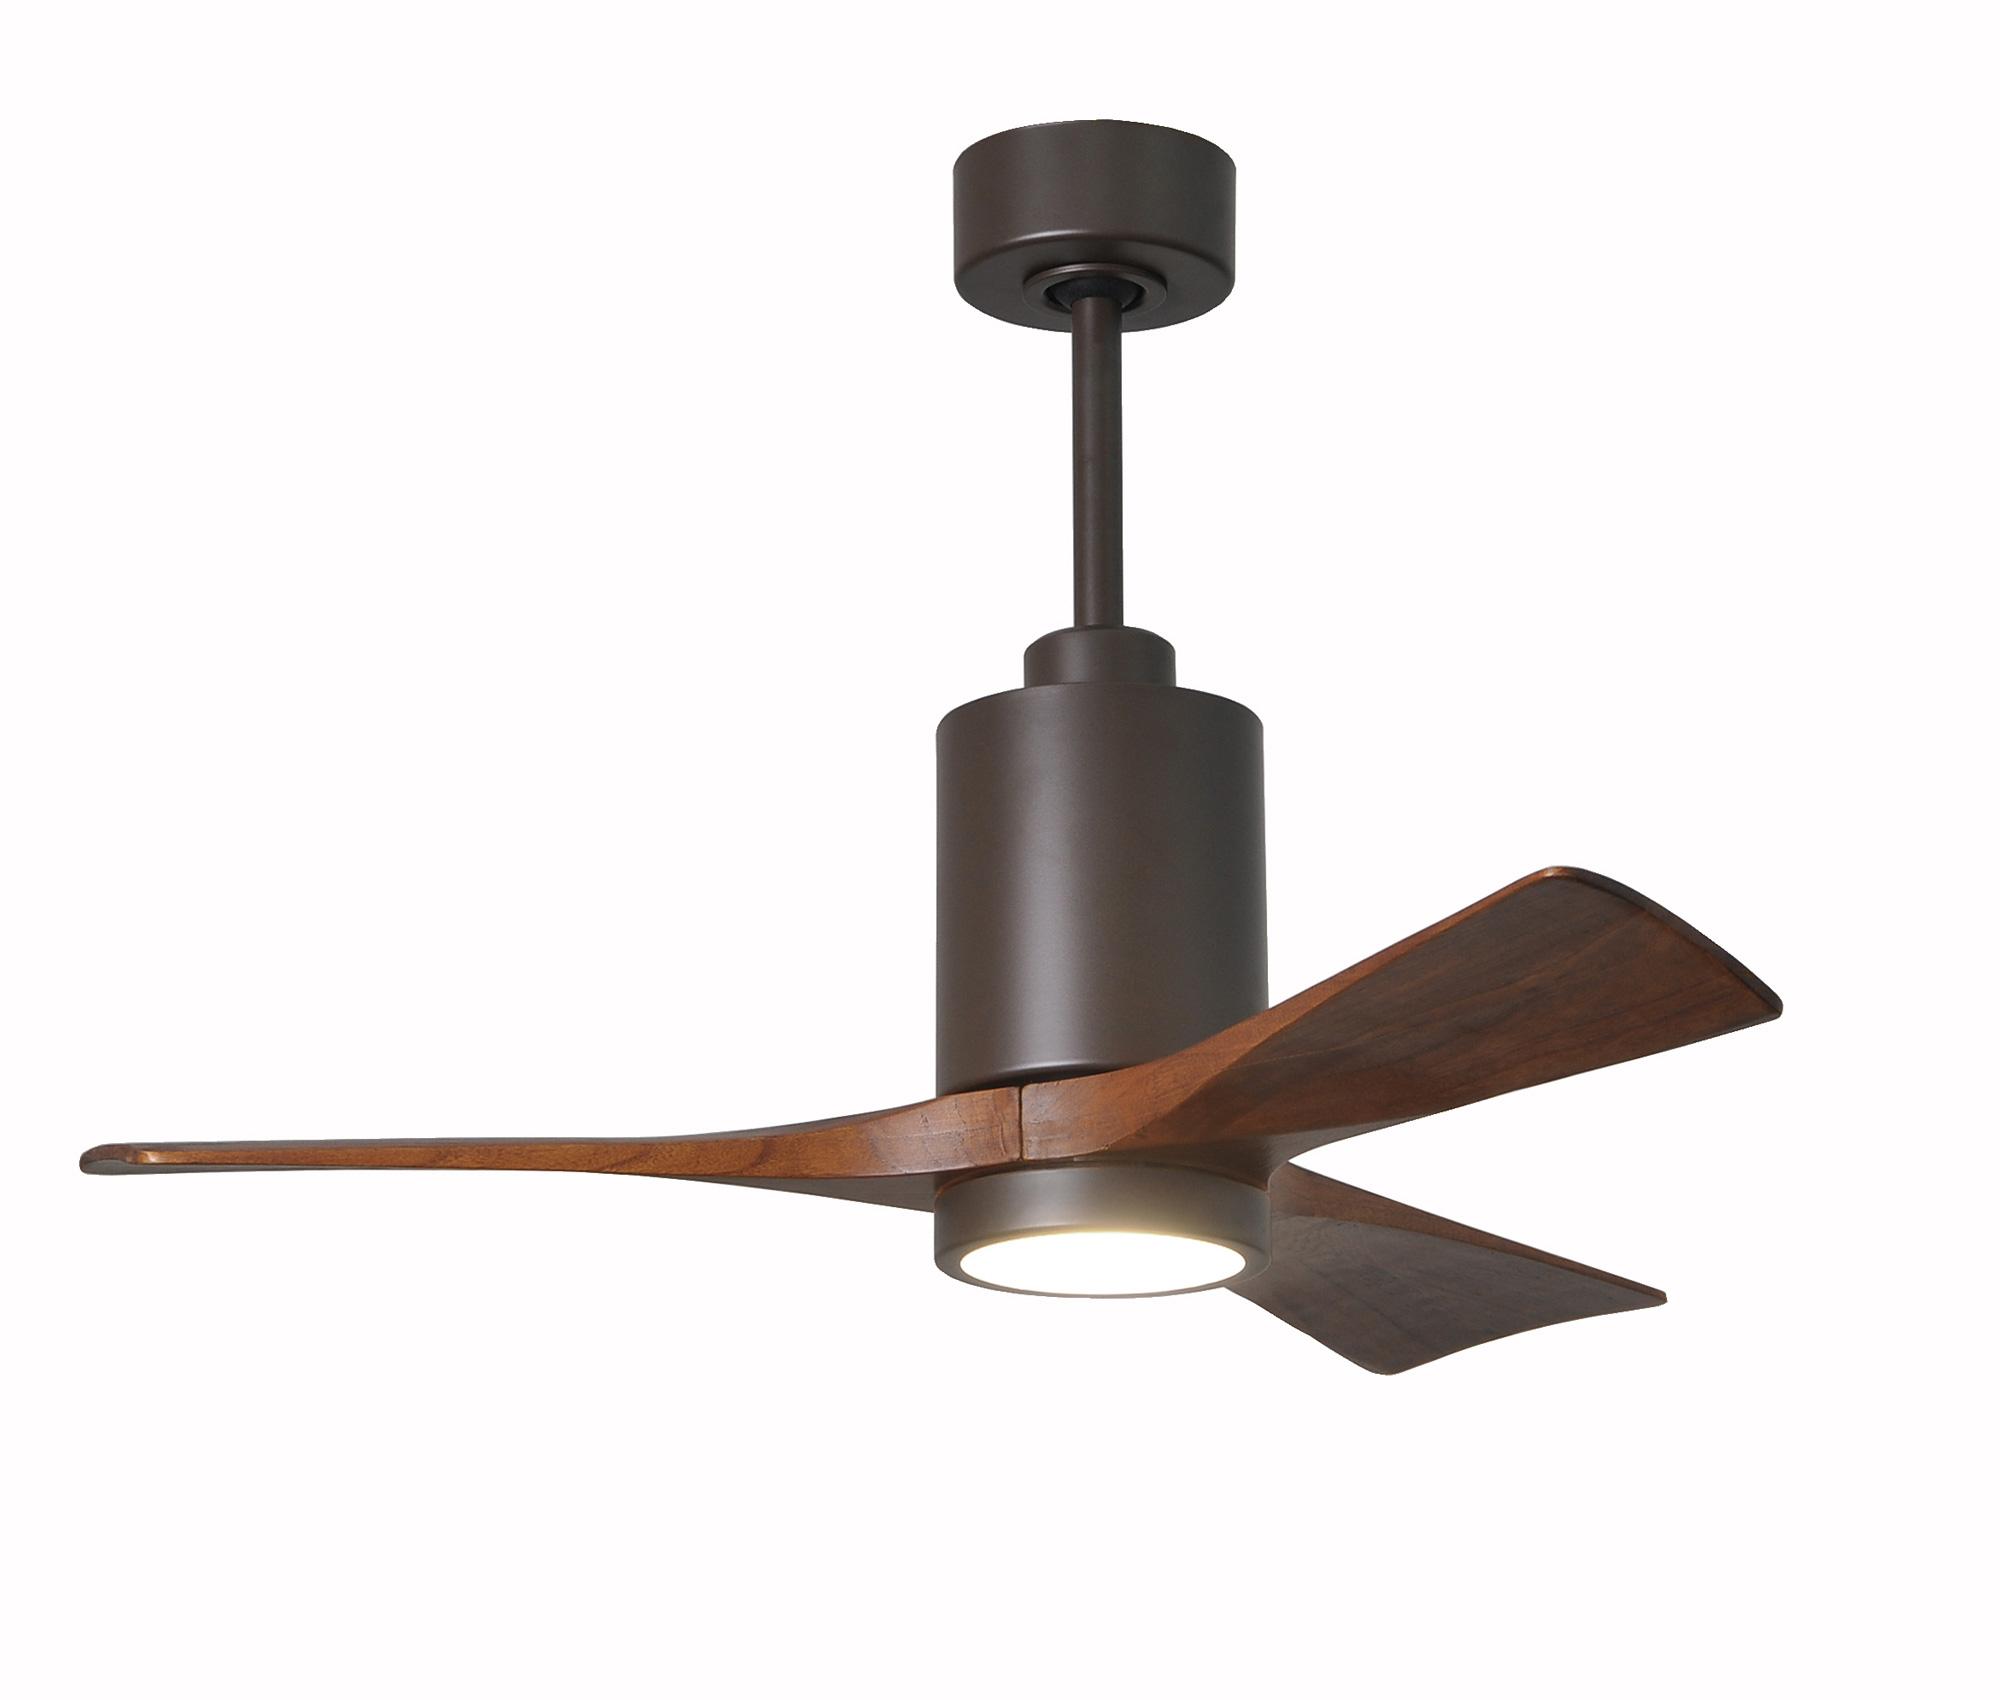 Minka Aire 52 Gauguin Tropical 4 Blade Indoor Outdoor: Patricia 3 Blade Indoor / Outdoor Ceiling Fan With Light